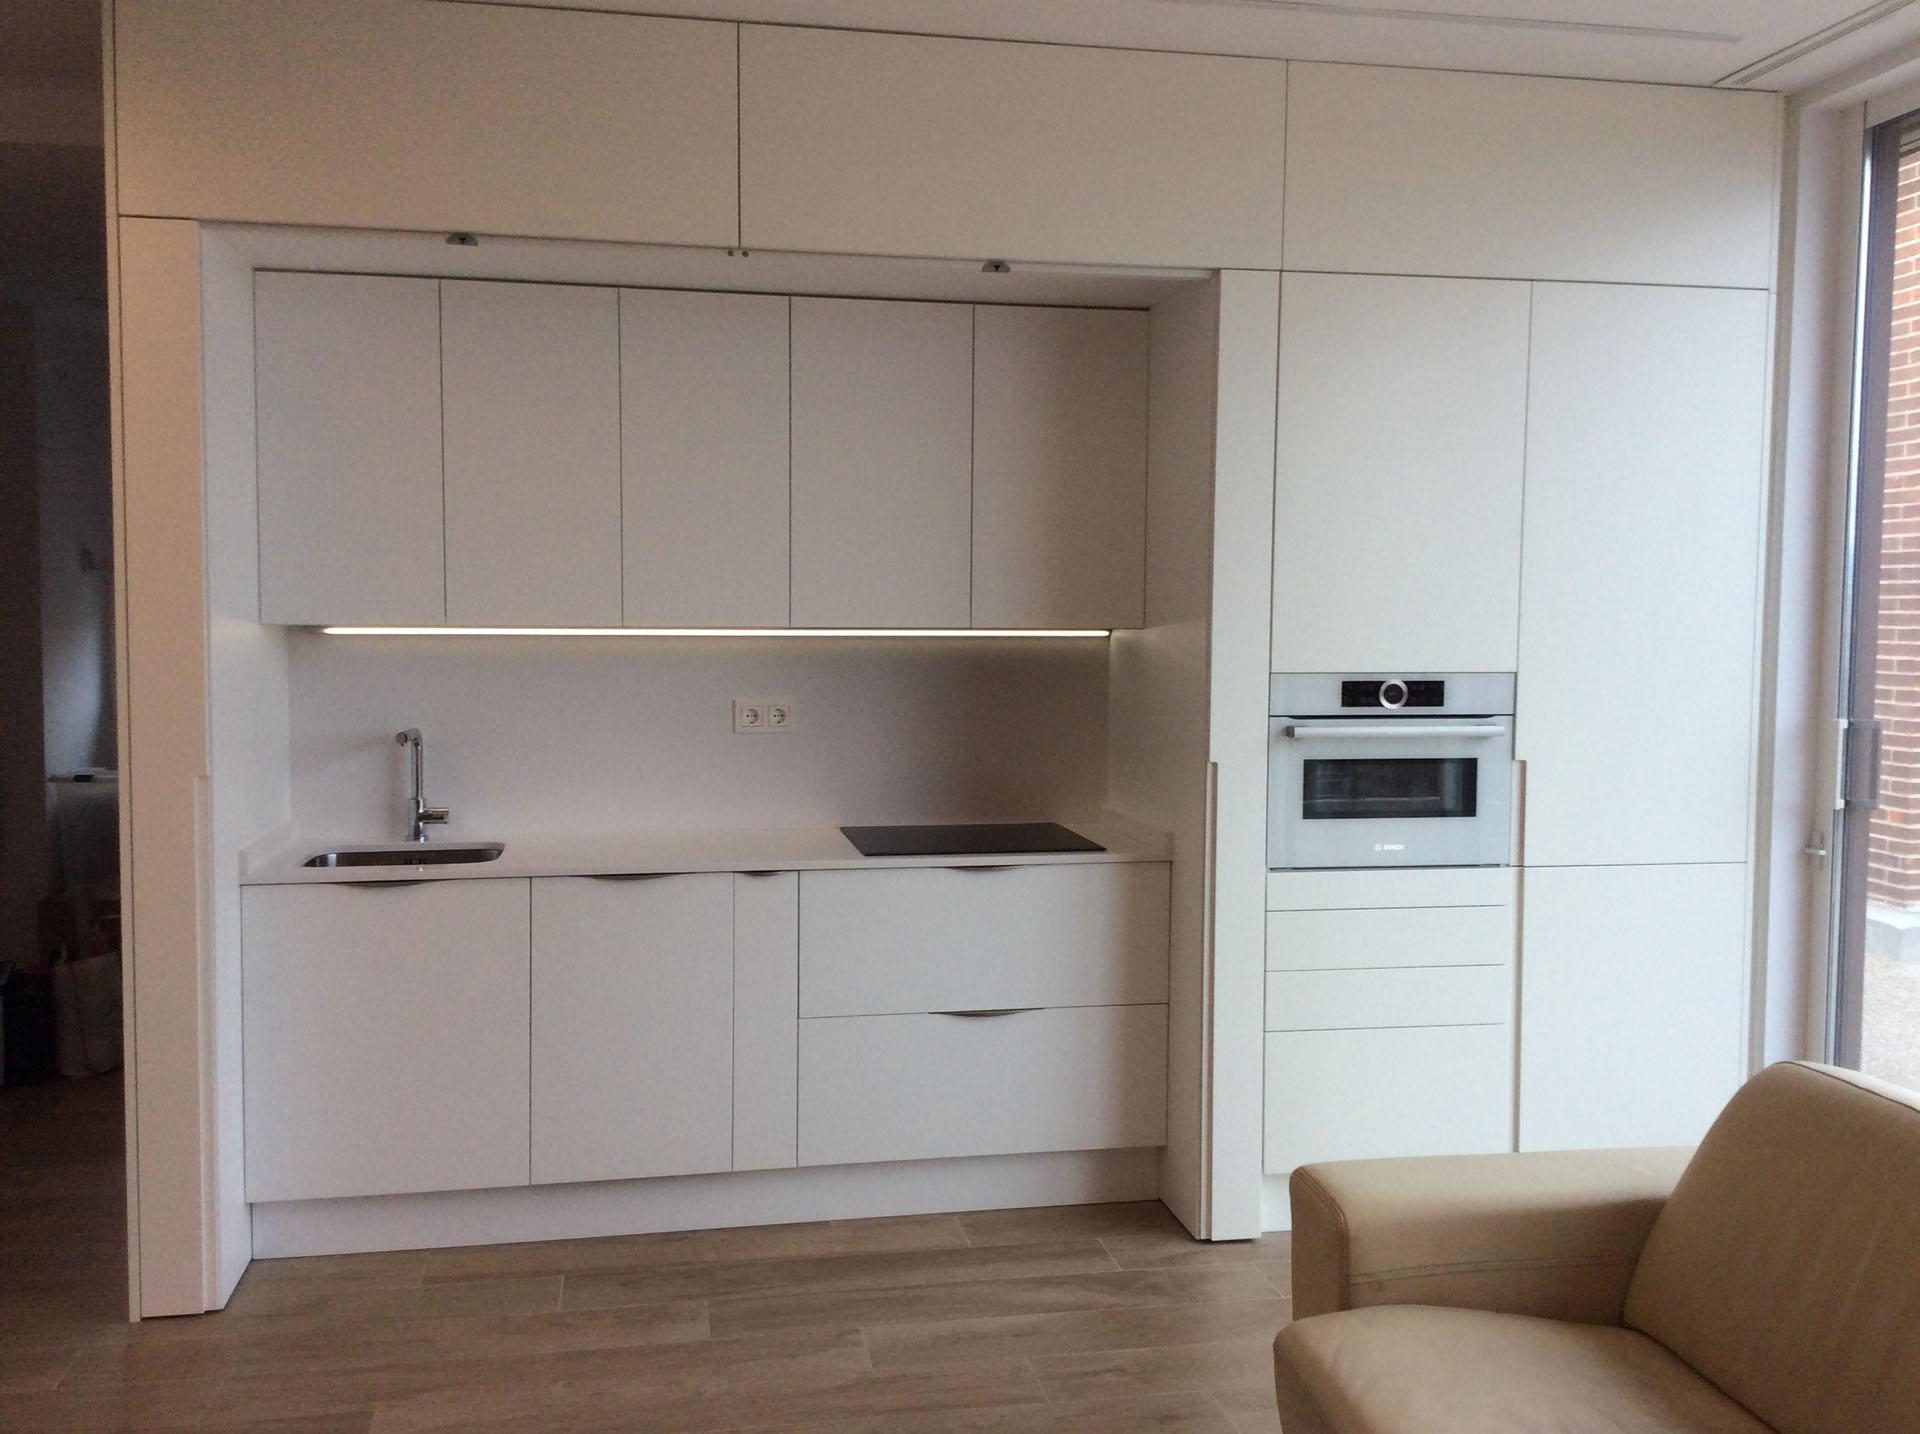 Cocina con puertas de ocultaci n escamoteables abiertas for Proyectos de cocina easy